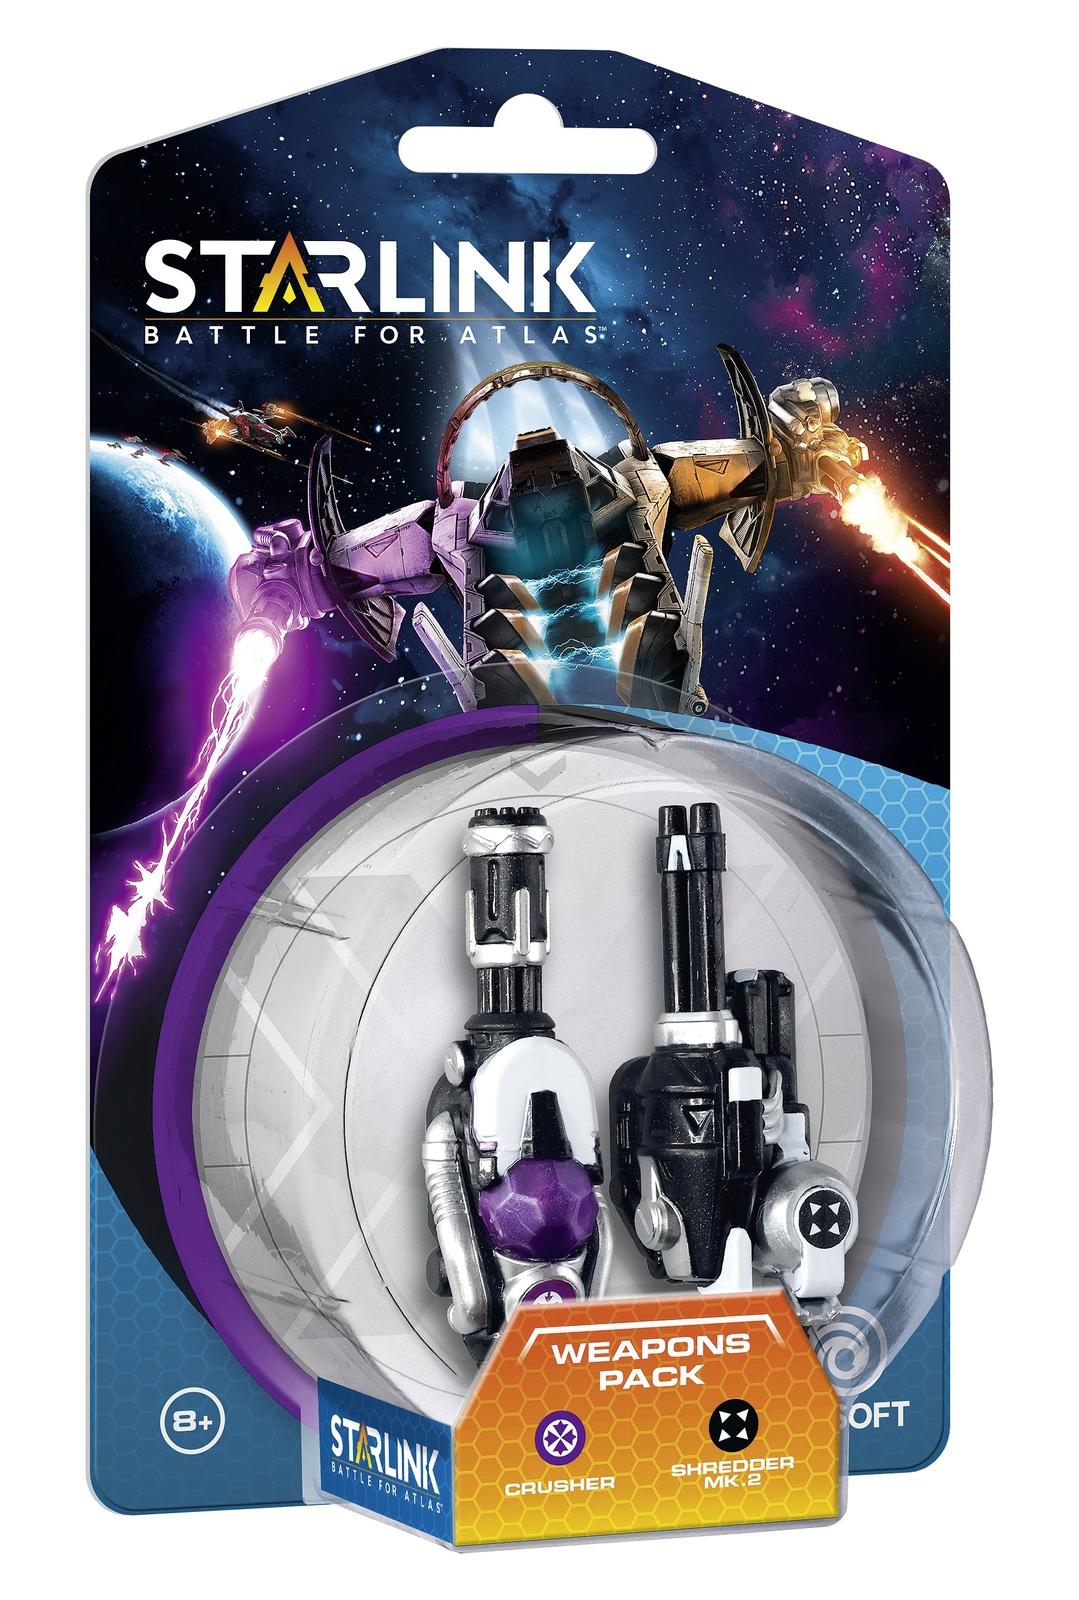 Starlink Weapon Pack - Crusher/Shredder for  image